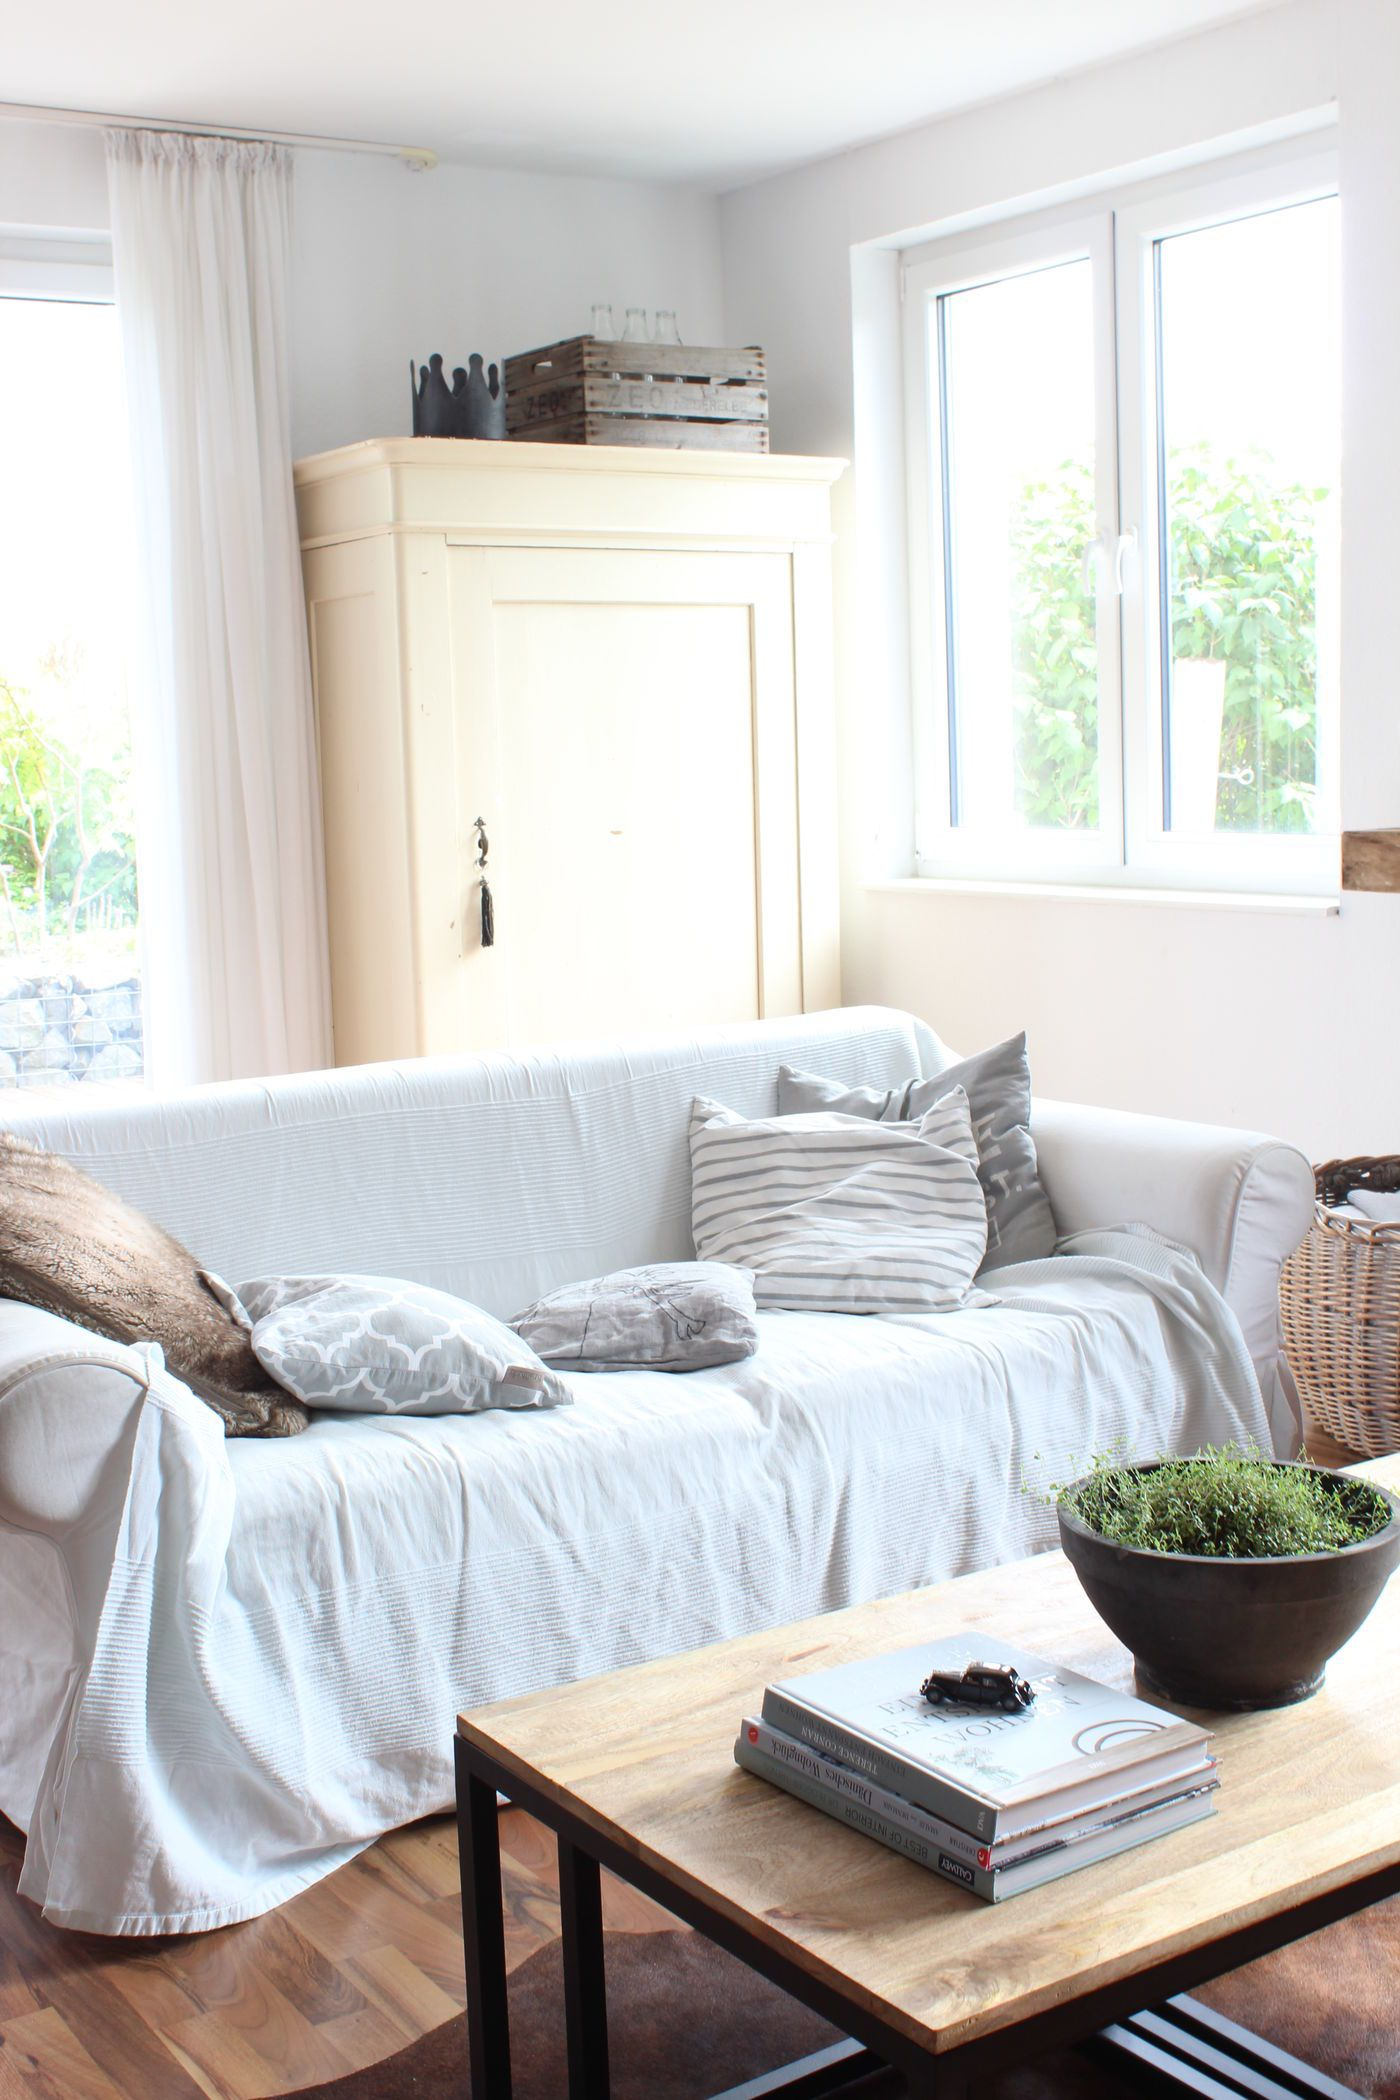 Ikea Sofa Riecht Romantische Schlafsofas Feng Shui Farben Im